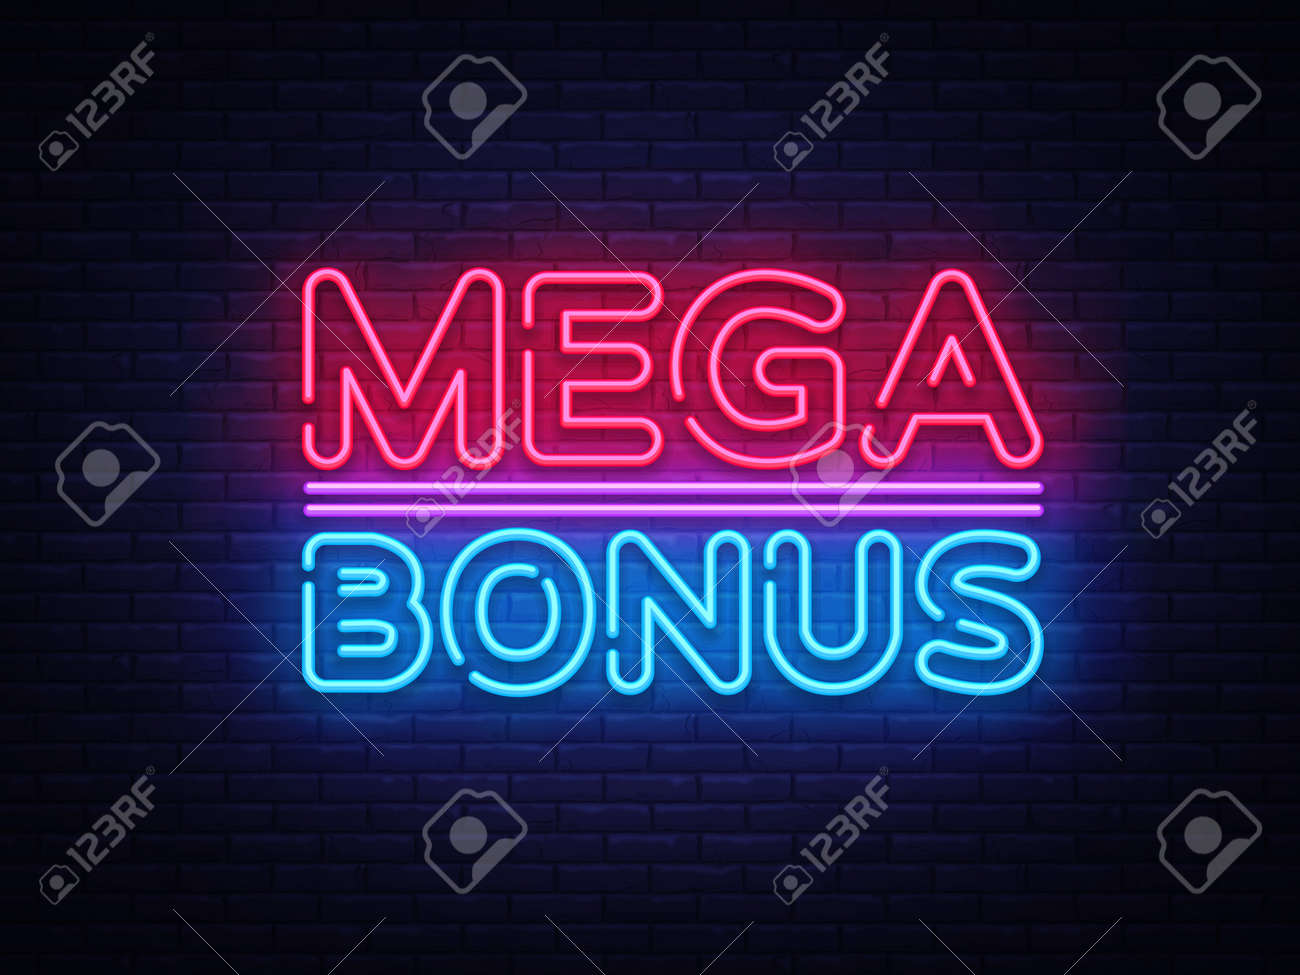 Mega Bonus neon sign vector. Bonus neon text Design template neon sign, light banner, neon signboard, nightly bright advertising, light inscription. Vector Illustration. - 112227134